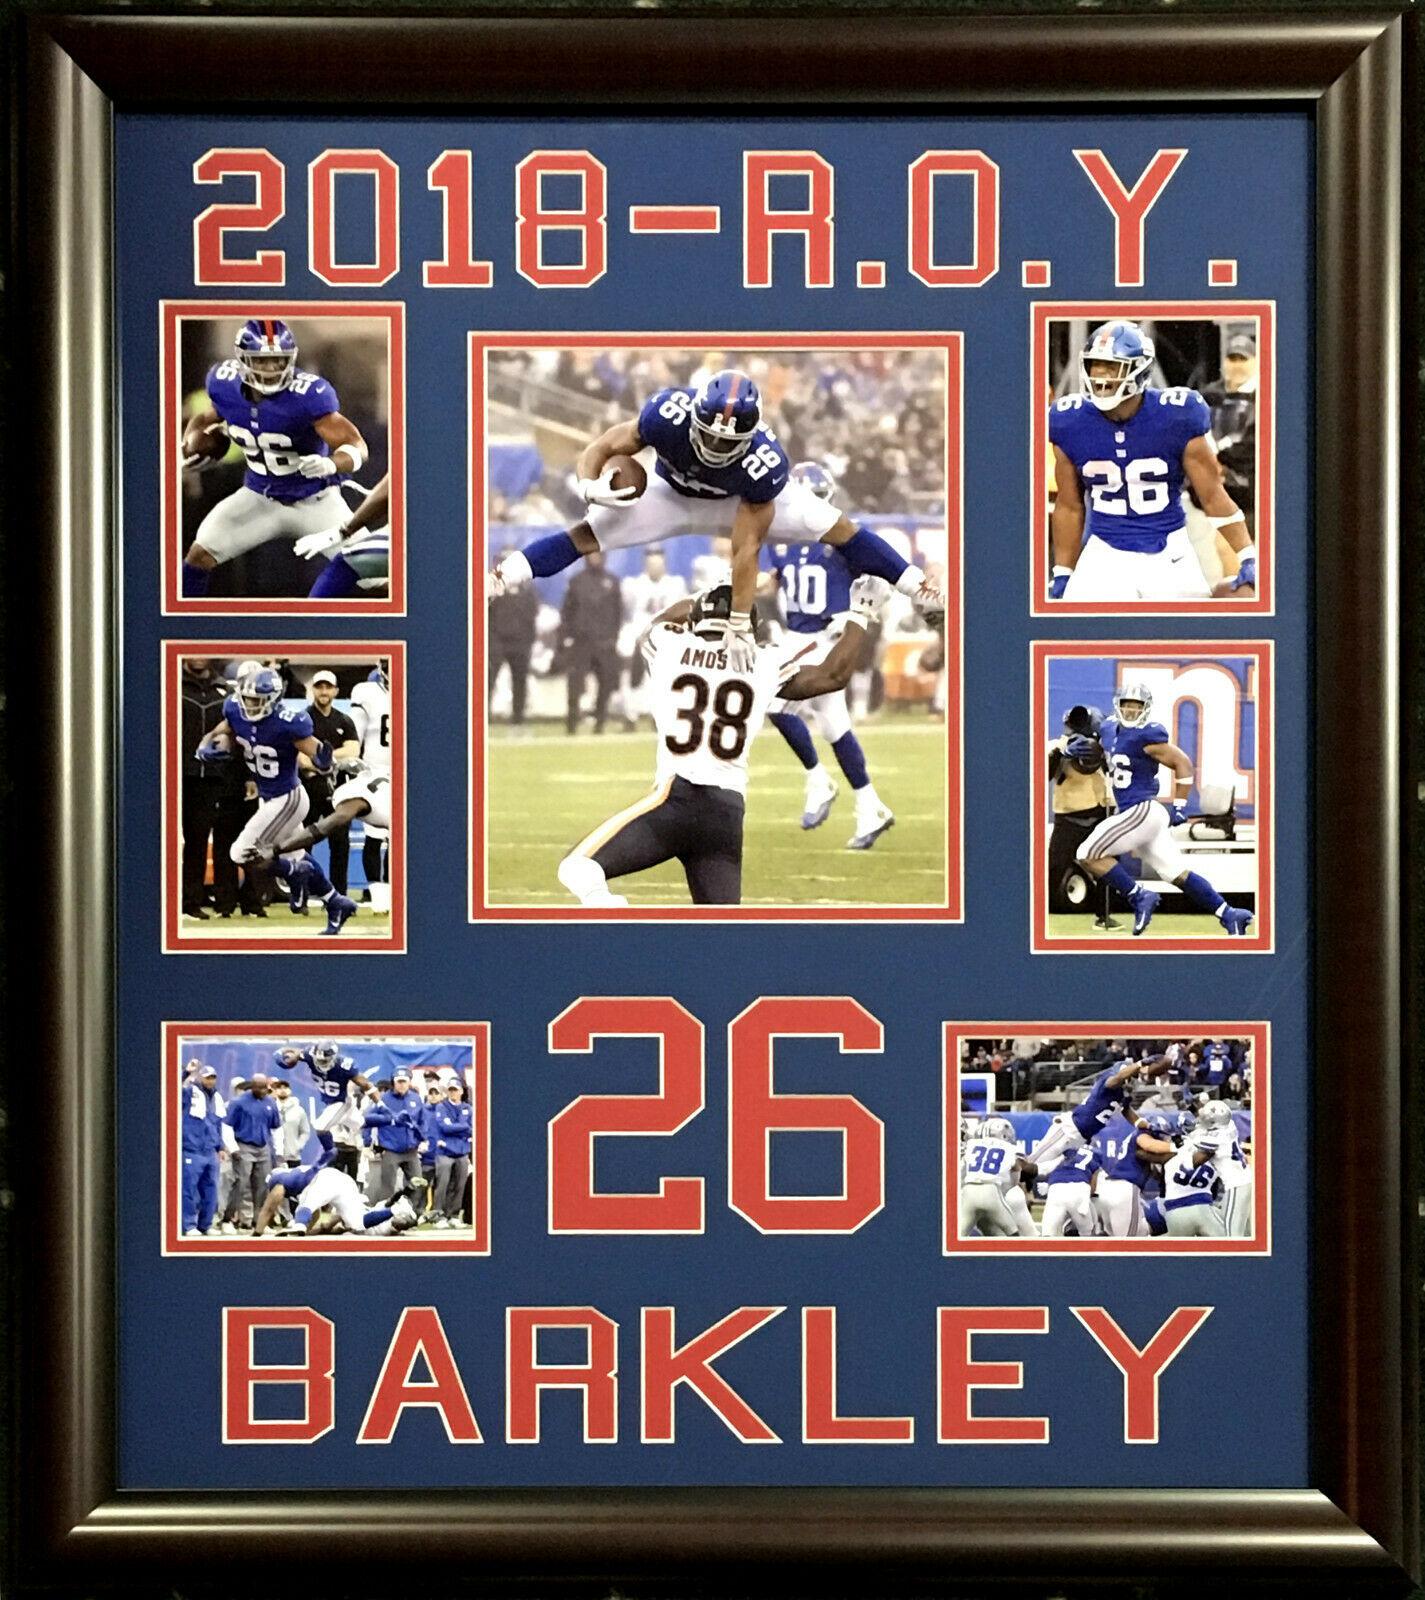 Saquon Barkley  #26 NY Giants RB 2018 ROY 7 photo framed 22×26 collage